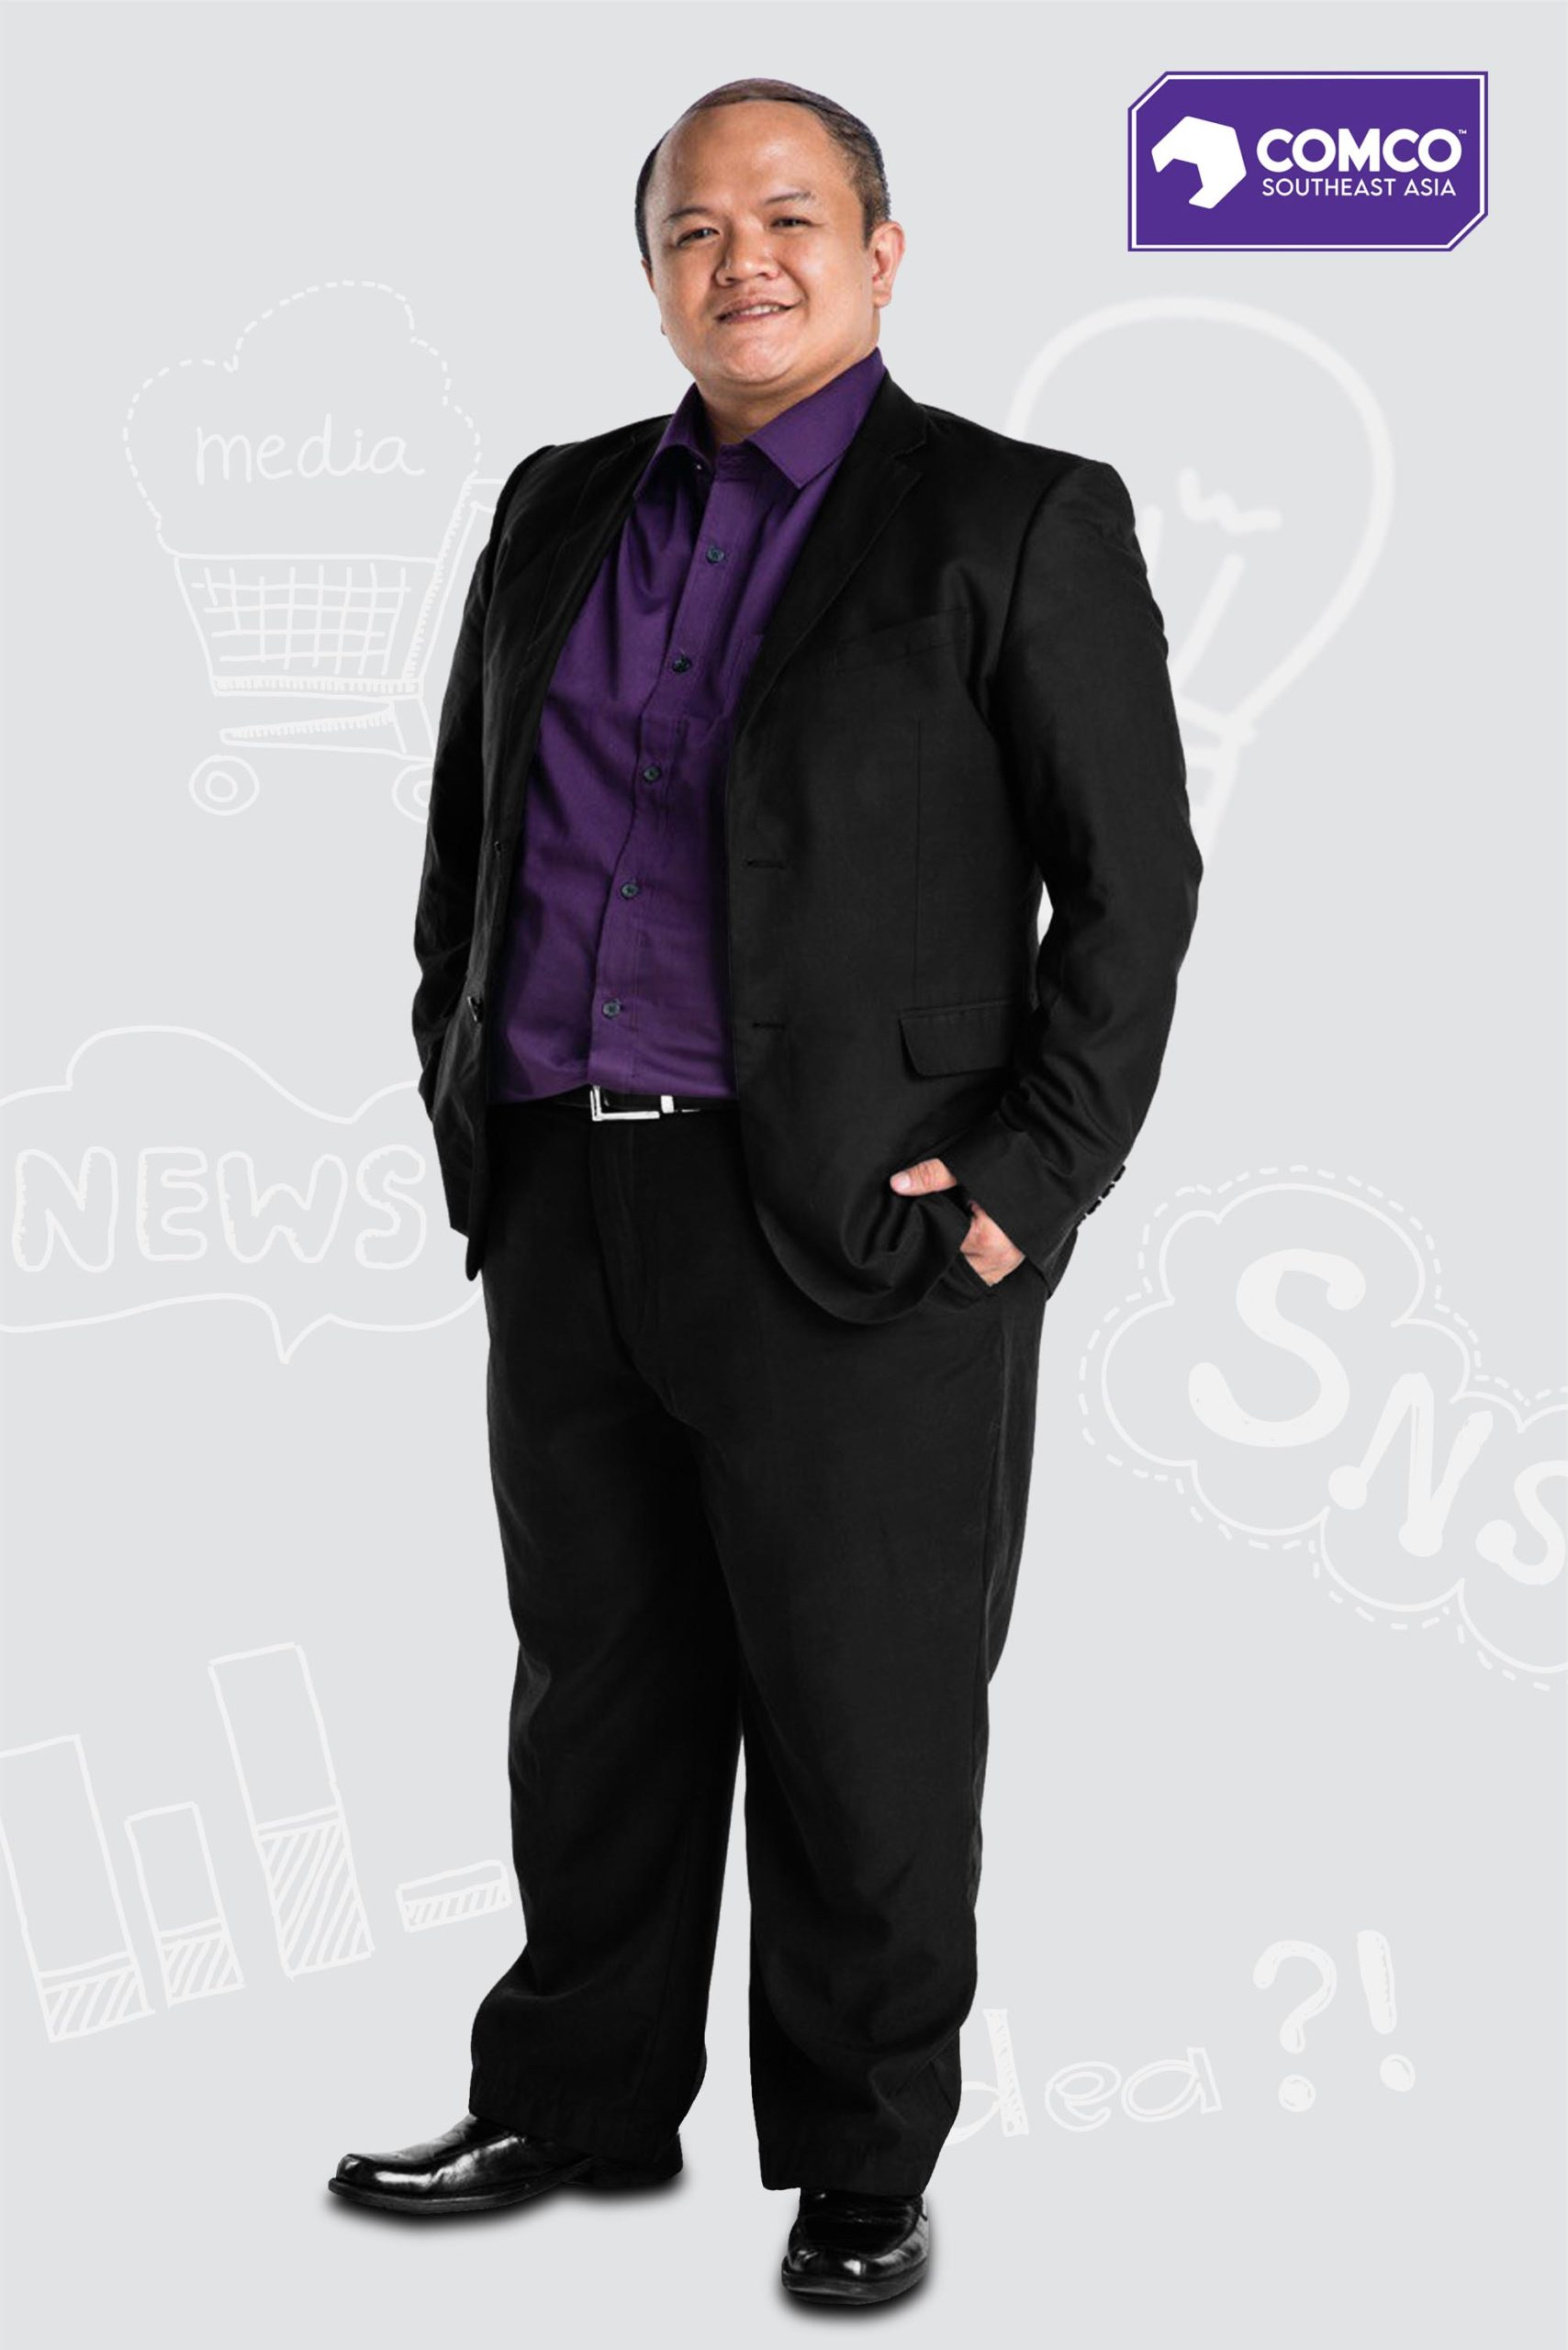 ComCo SEa - NEW PR Smart Social - Ferdinand Bondoy